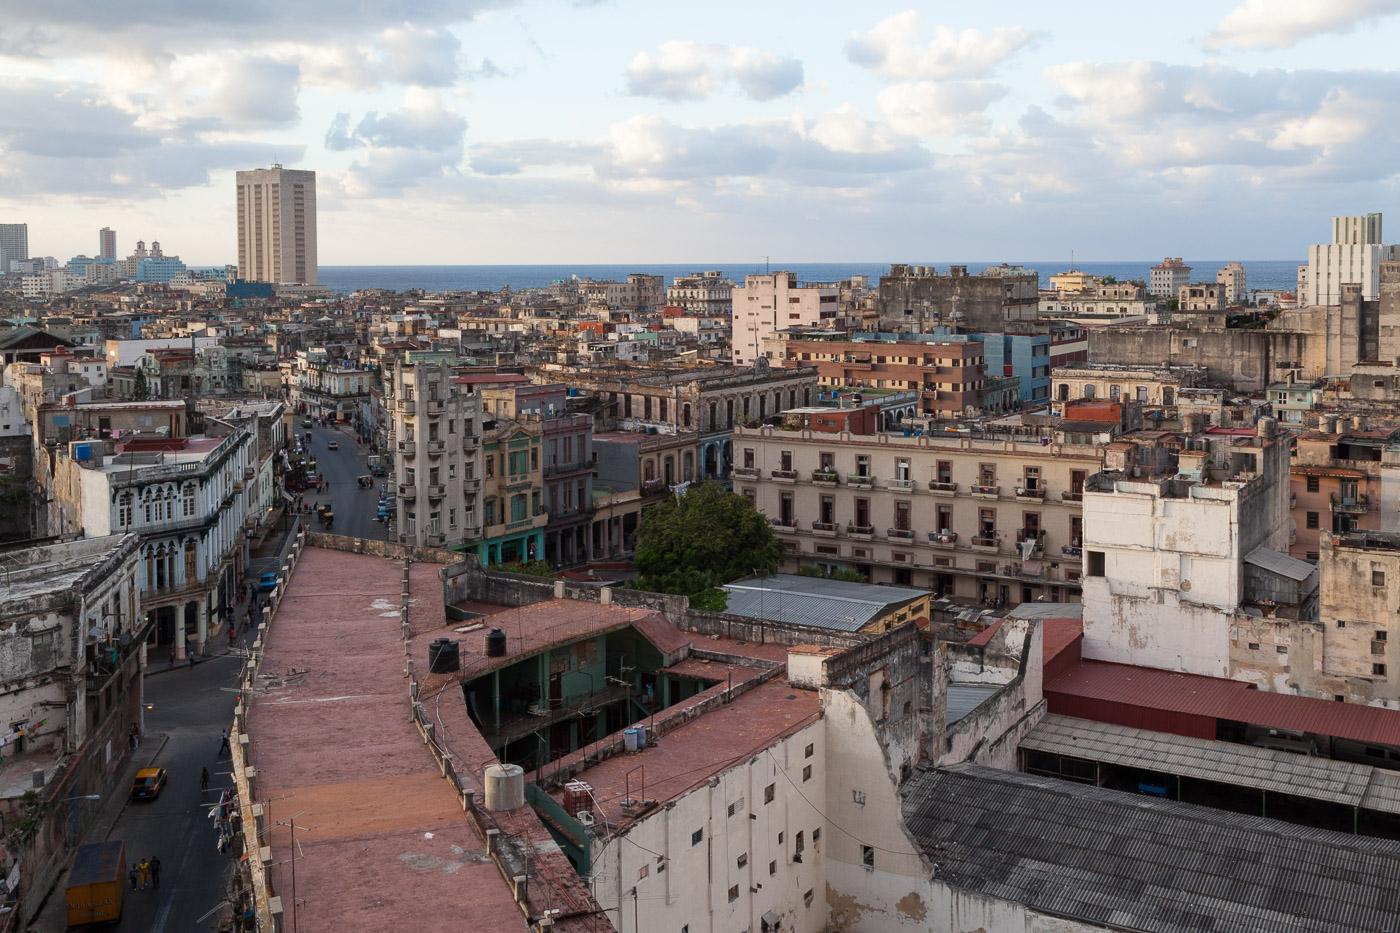 Havana from Above